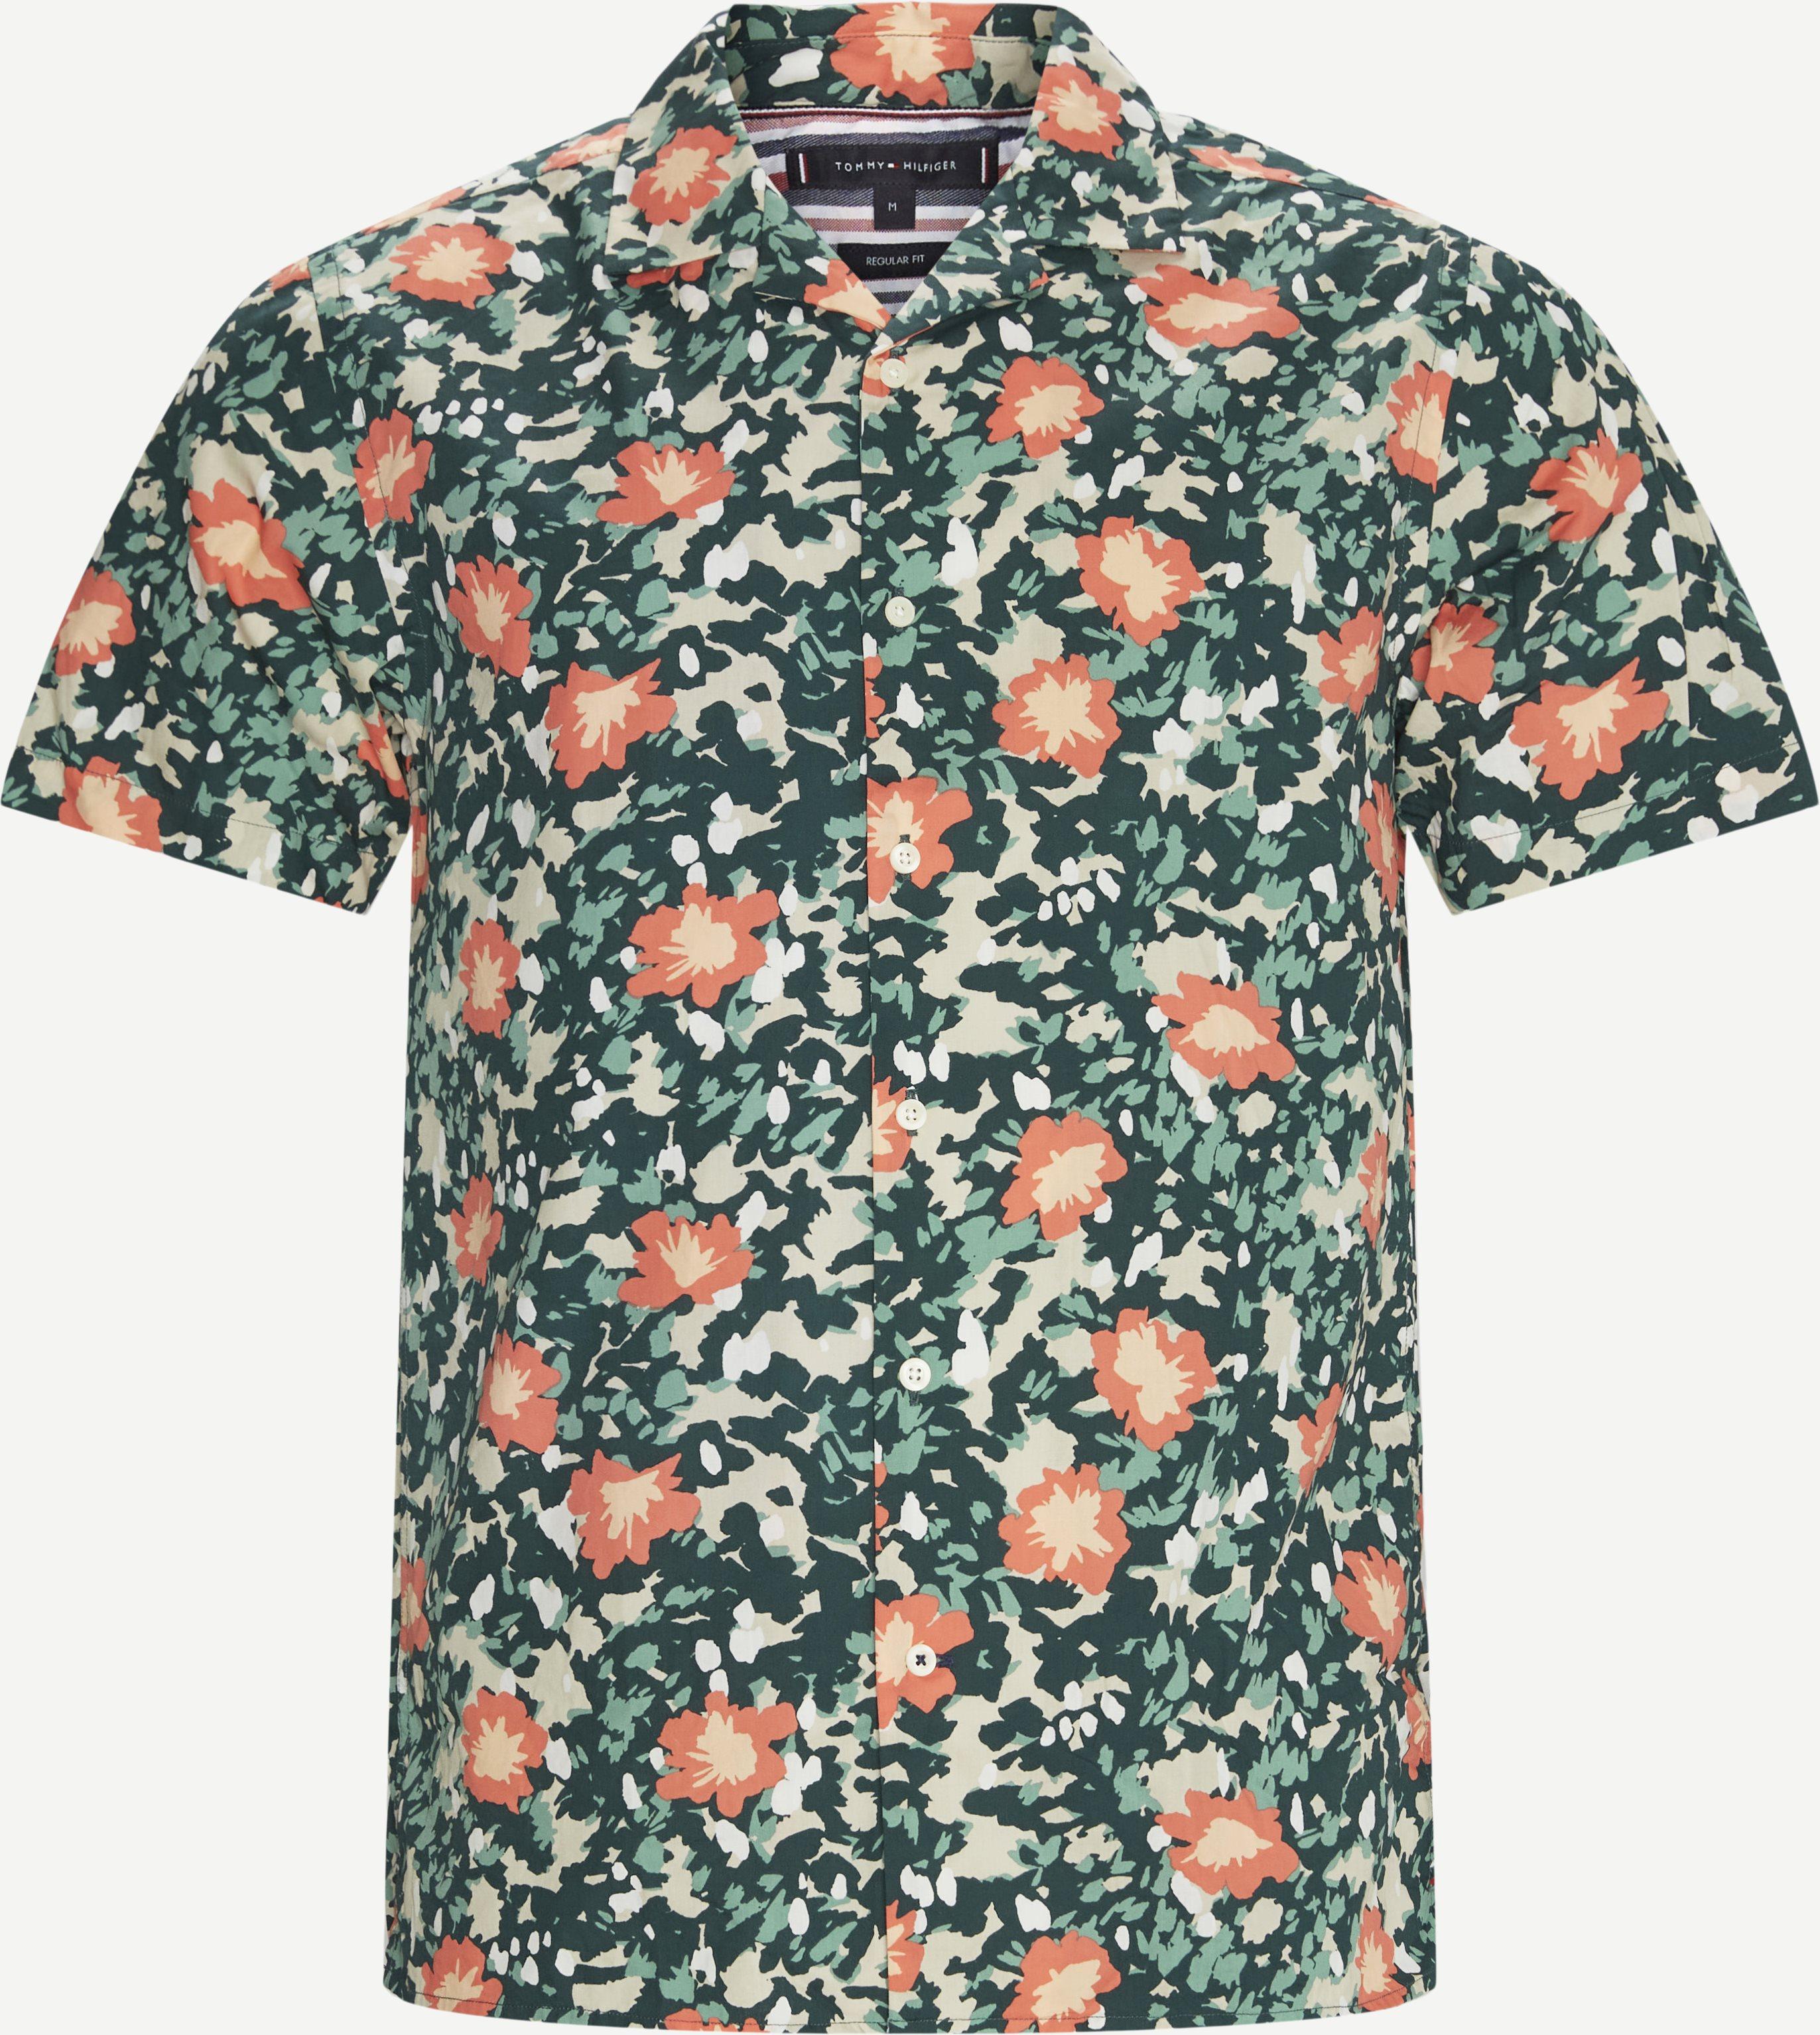 Floral Camo K/Æ Skjorte - Kortärmade skjortor - Regular fit - Multi